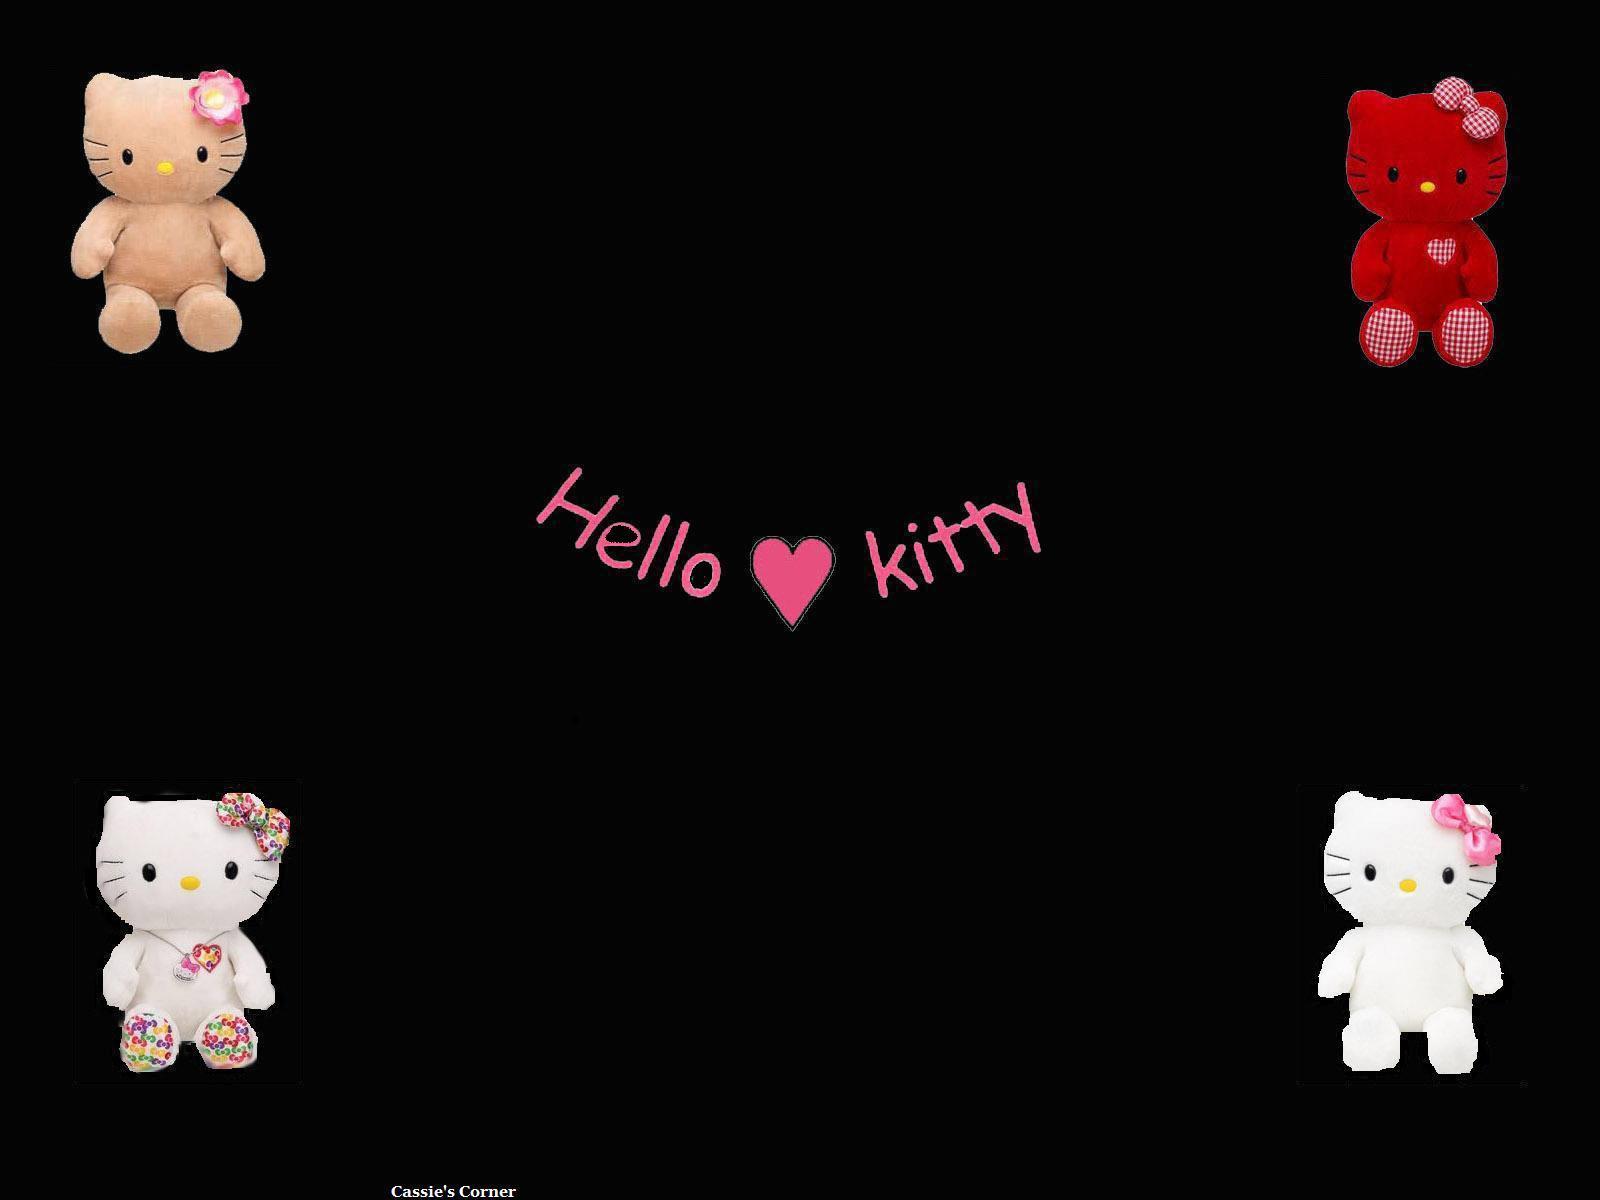 76 Hello Kitty Black And Pink Wallpaper On Wallpapersafari